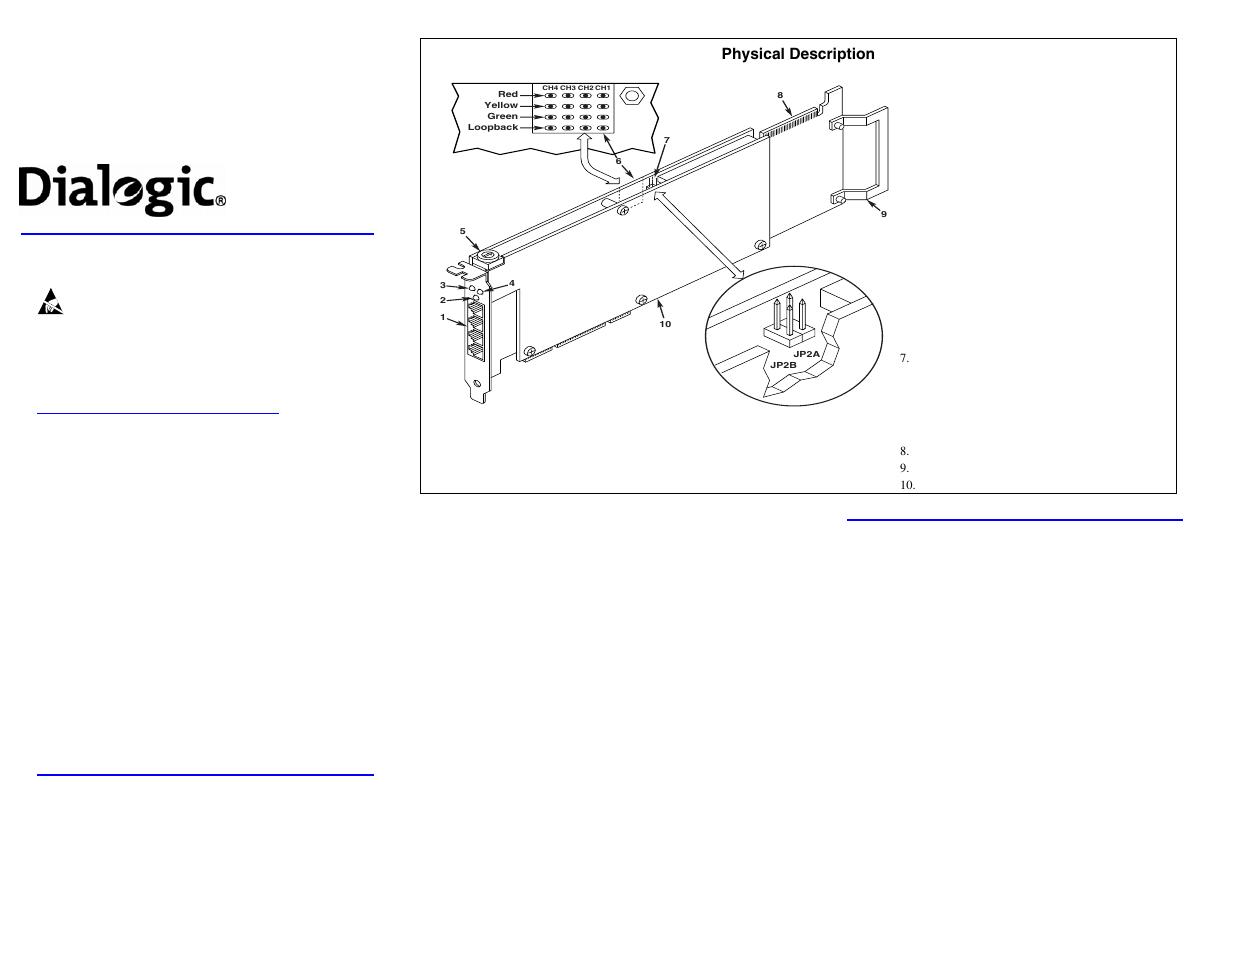 dialogic media board dmv1200btep user manual 2 pages rh manualsdir com Dialogic Communications Corp Dialogic Organization Develop